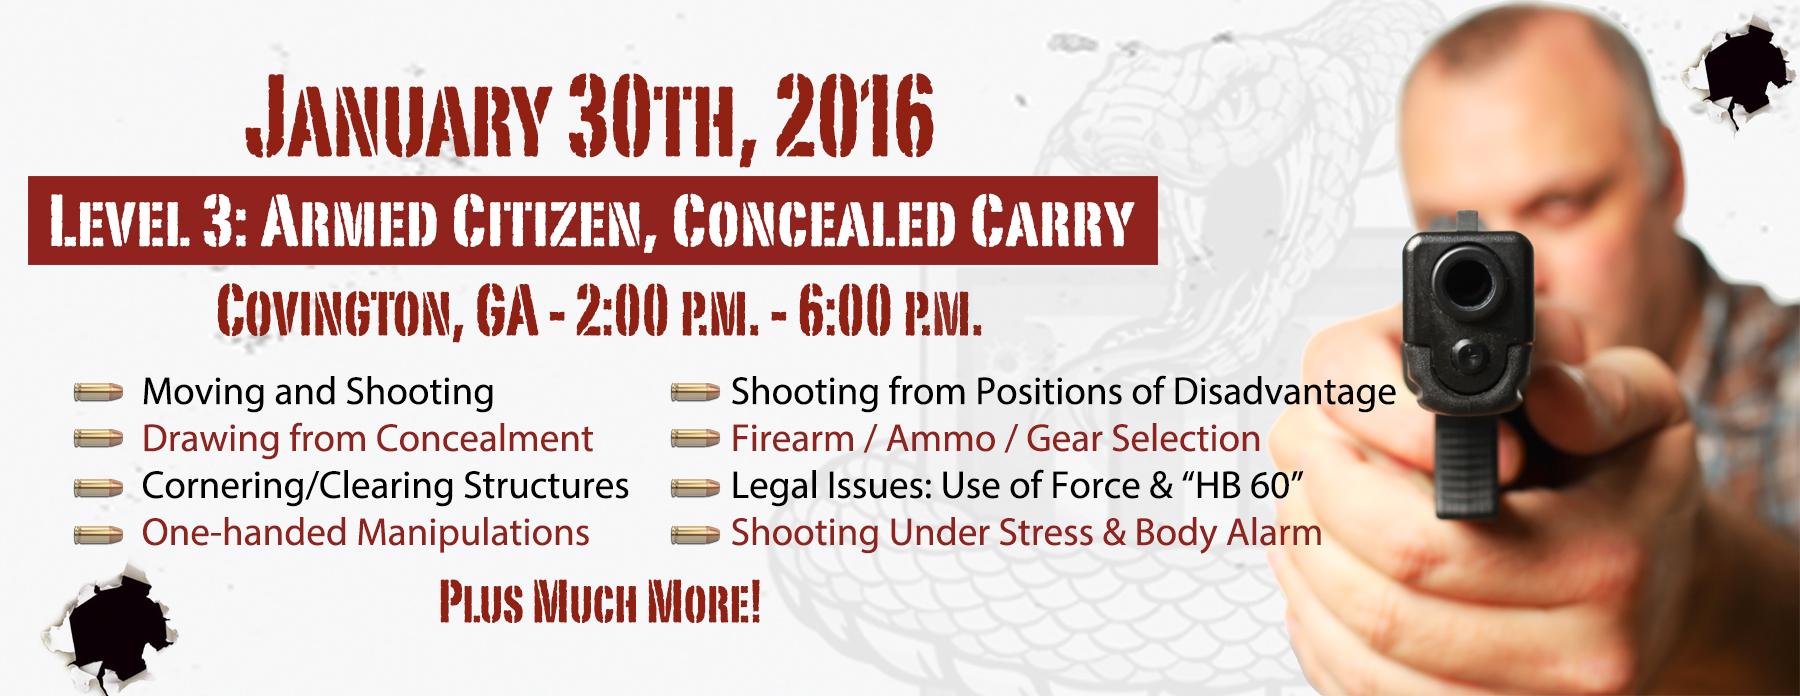 Concealed Carry Handgun Training - Atlanta Georgia